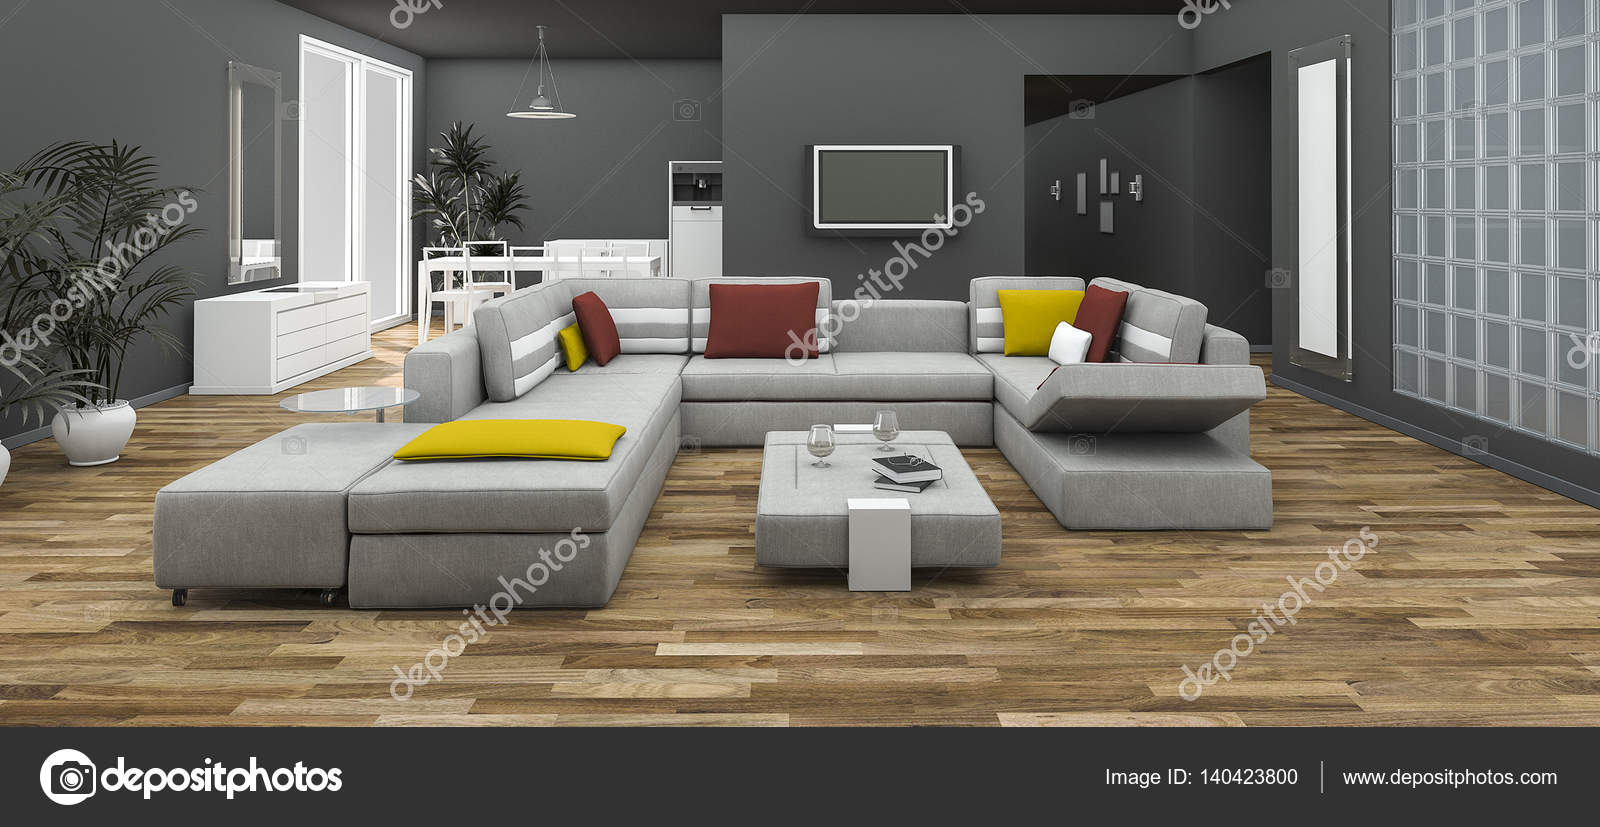 Wondrous 3D Rendering Colorful Sofa Set With Loft Style Room Stock Inzonedesignstudio Interior Chair Design Inzonedesignstudiocom